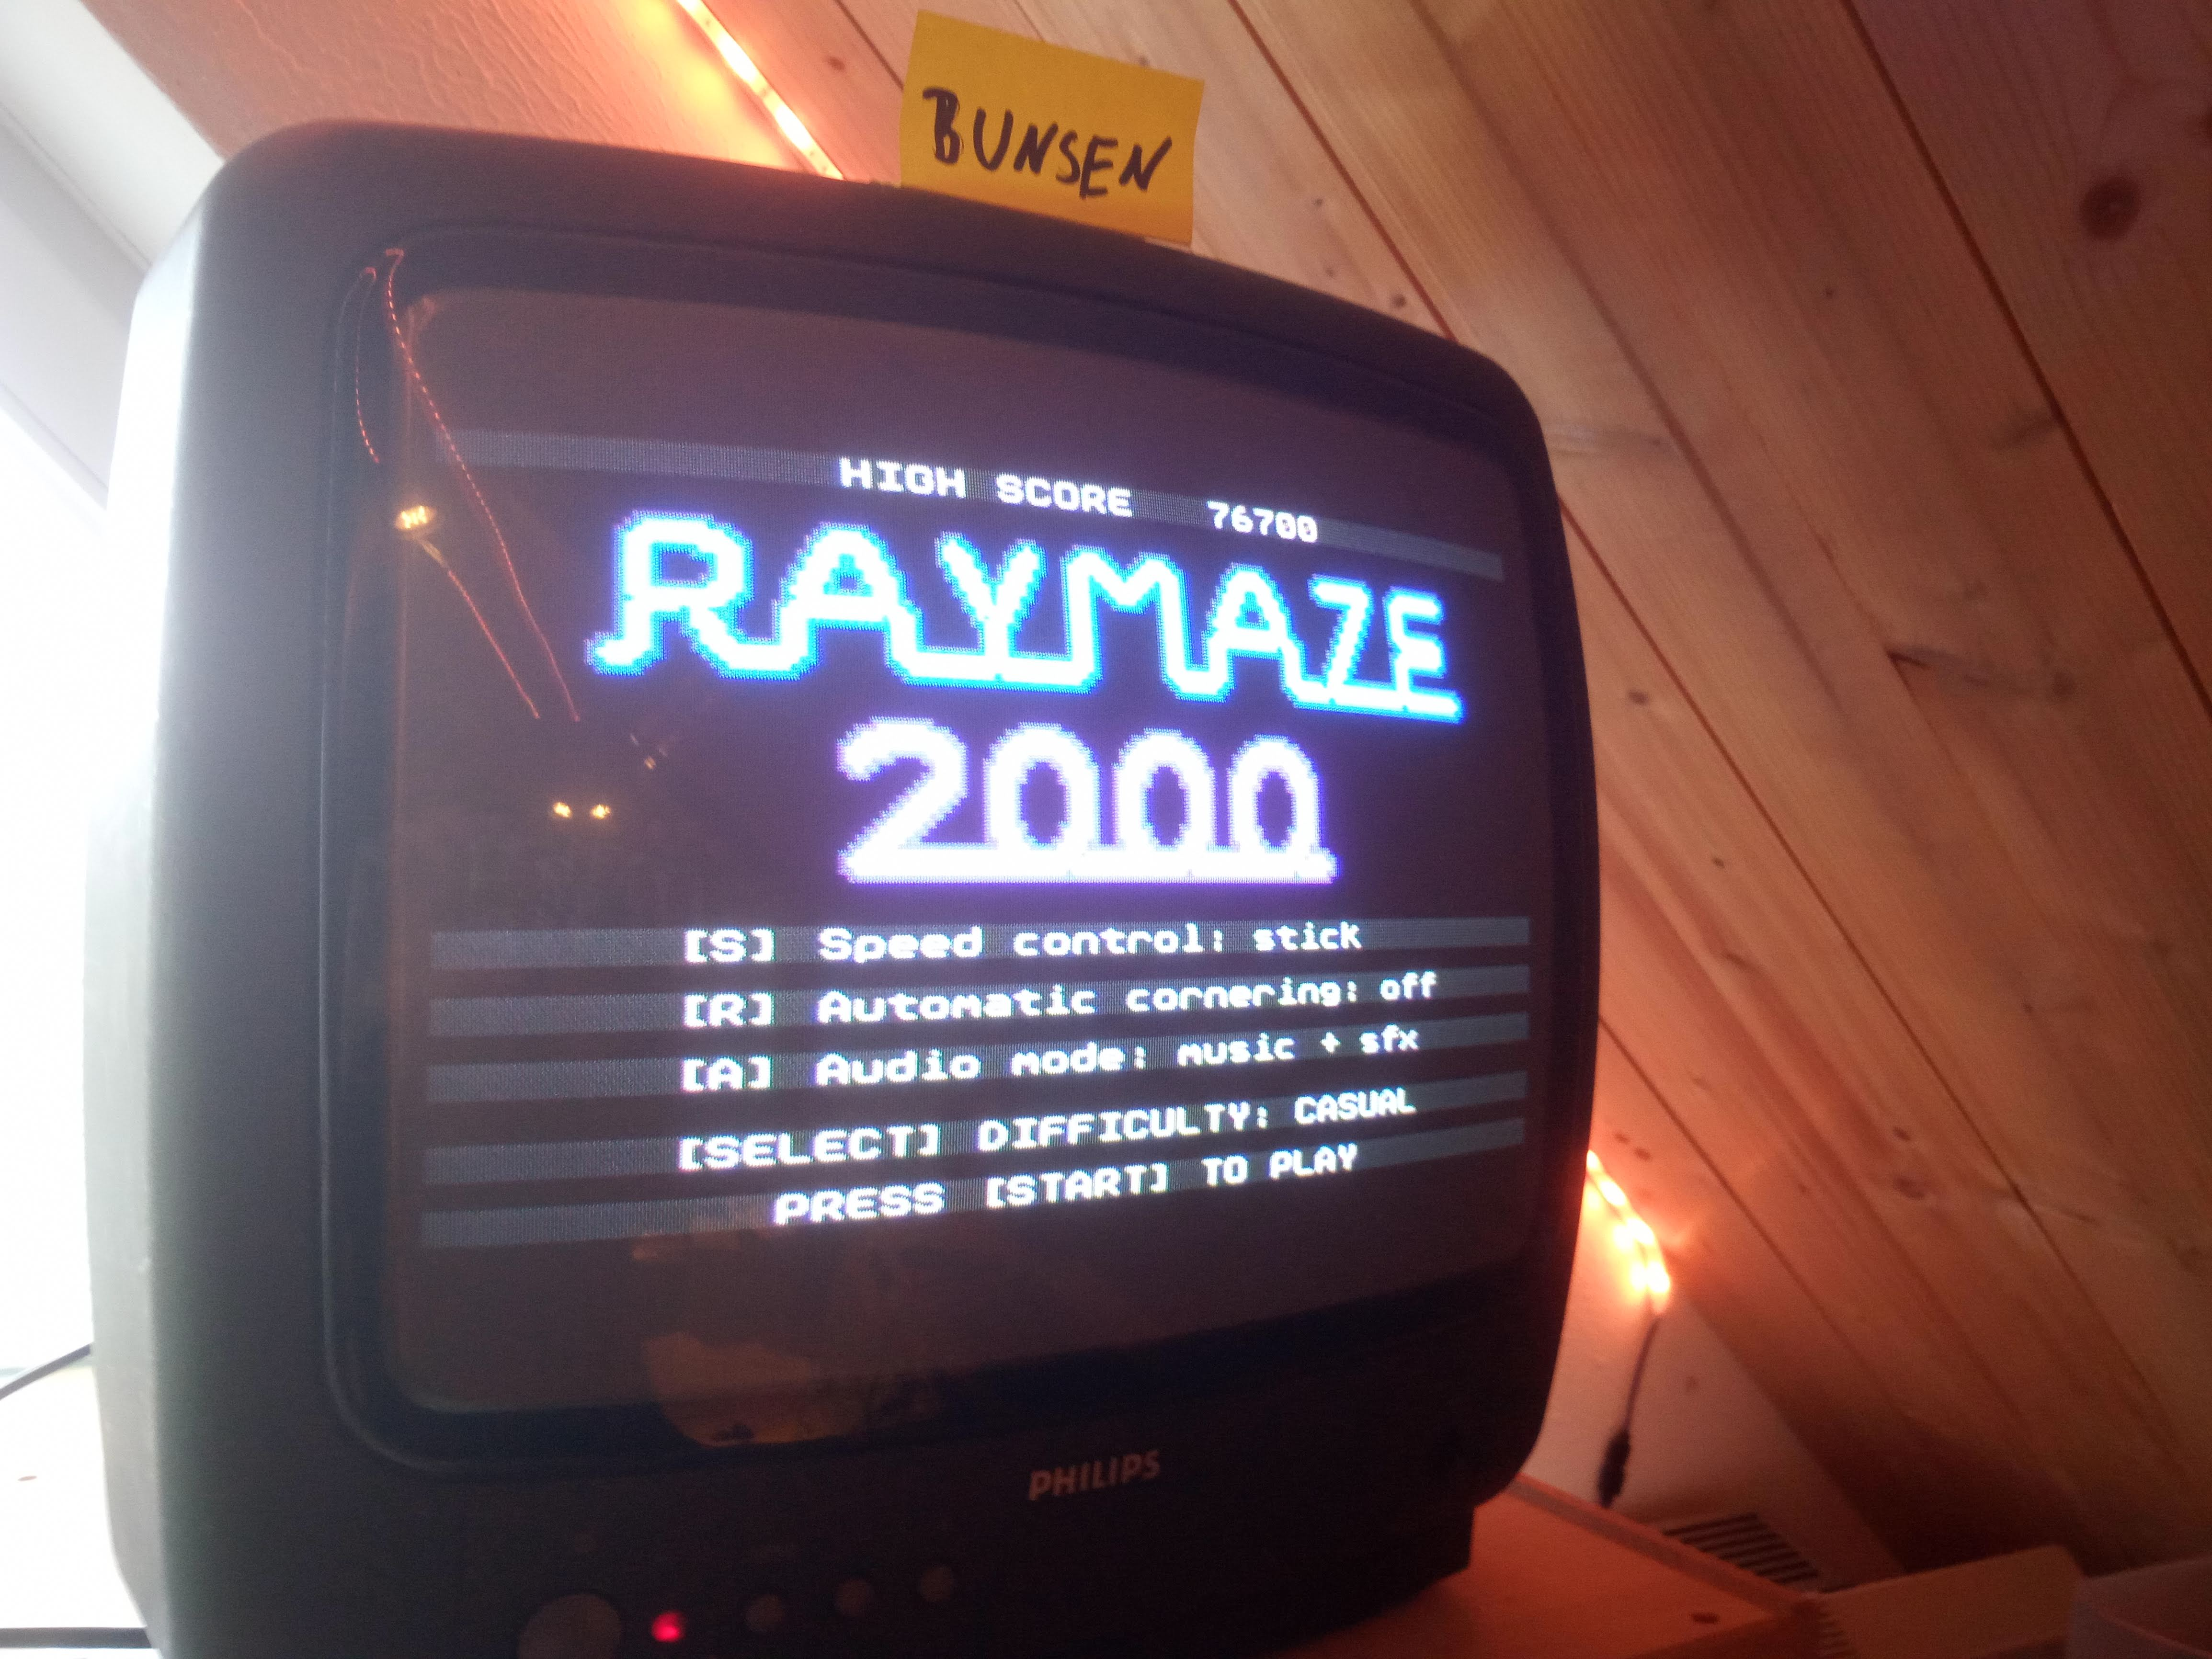 Bunsen: Raymaze 2000 [Difficulty: Casual] (Atari 400/800/XL/XE) 76,700 points on 2020-05-18 13:30:53